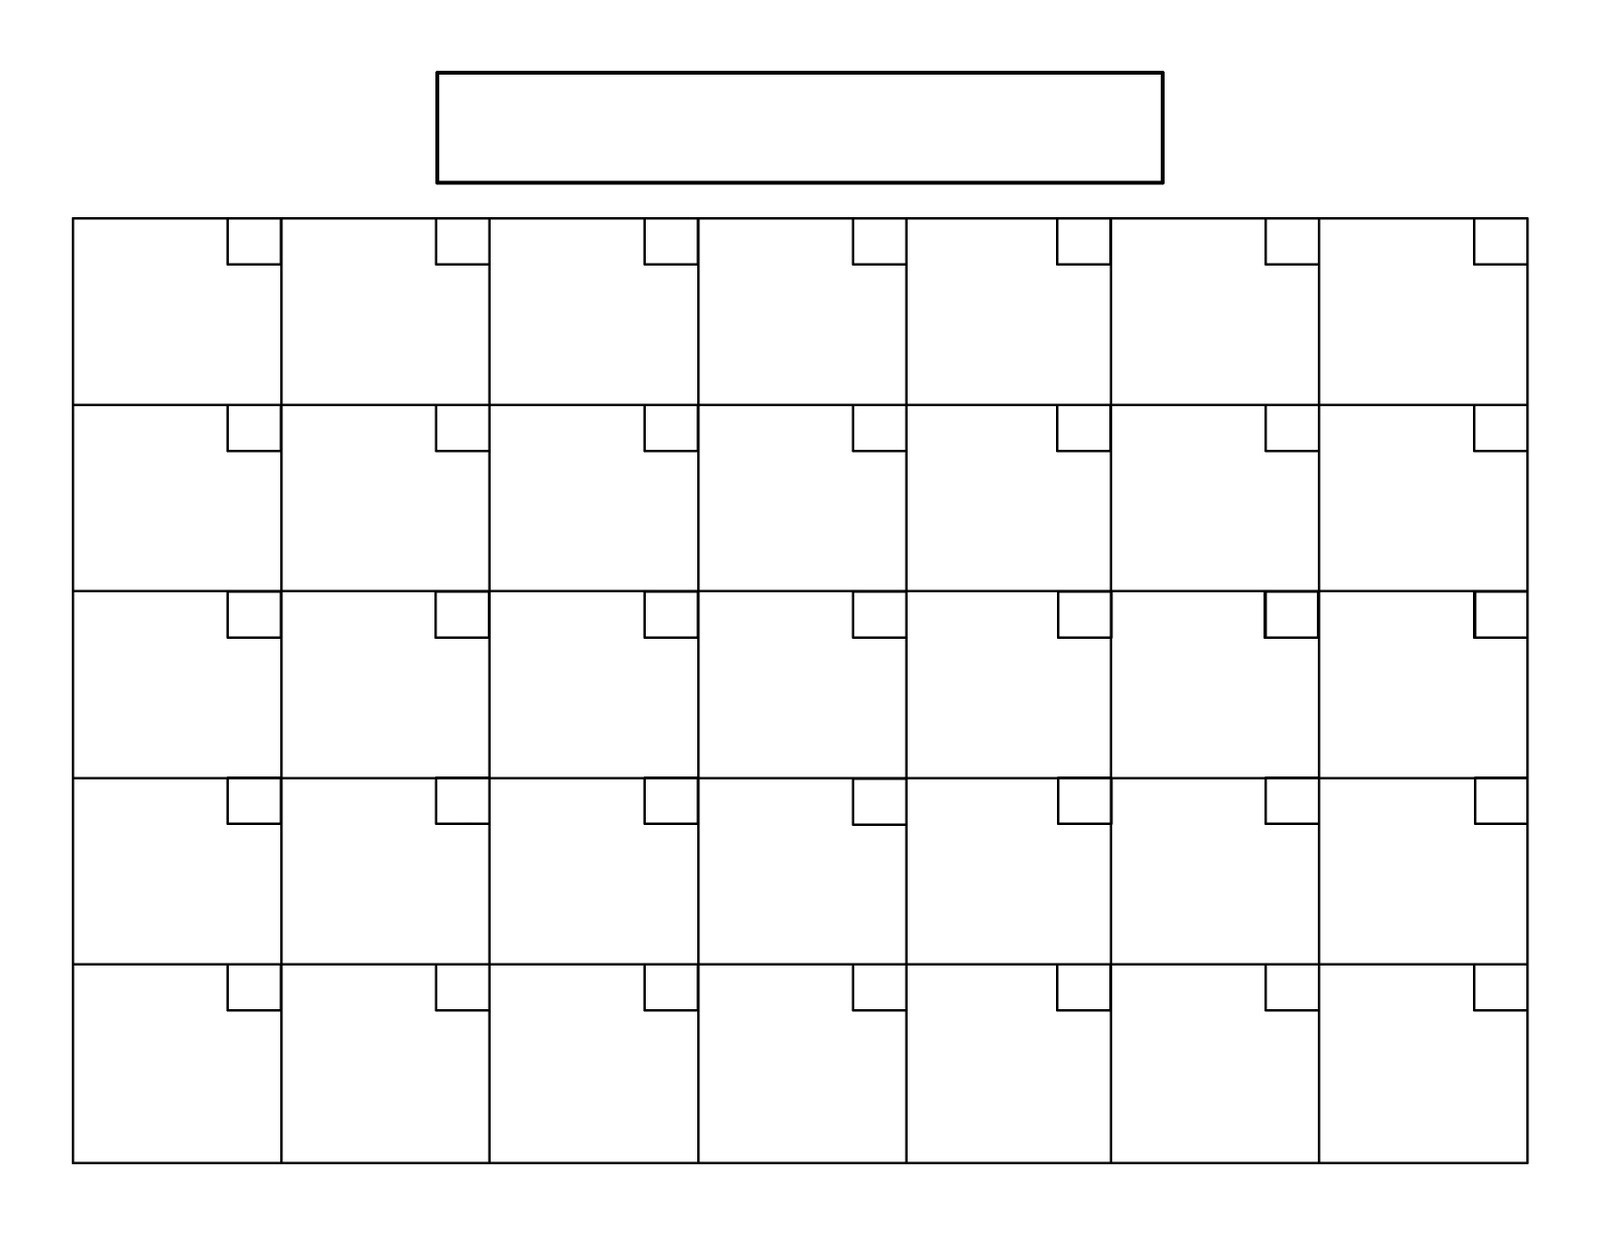 Printable 5 Day Monthly Calendar • Printable Blank Calendar Template within 5 Day Blank Calendar Template